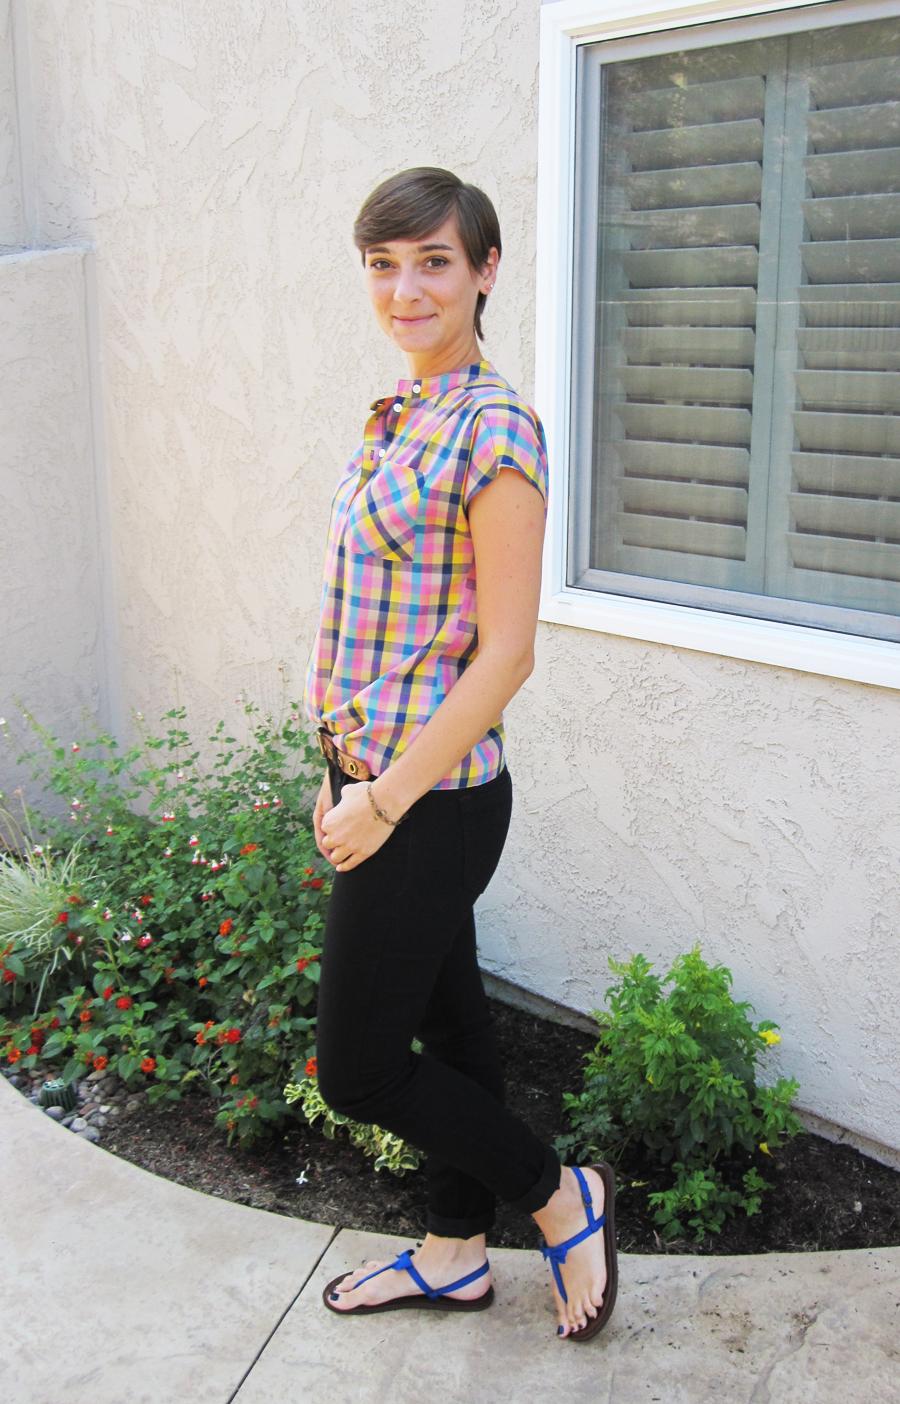 ootd - vintage check shirt, black skinny jeans, sandals